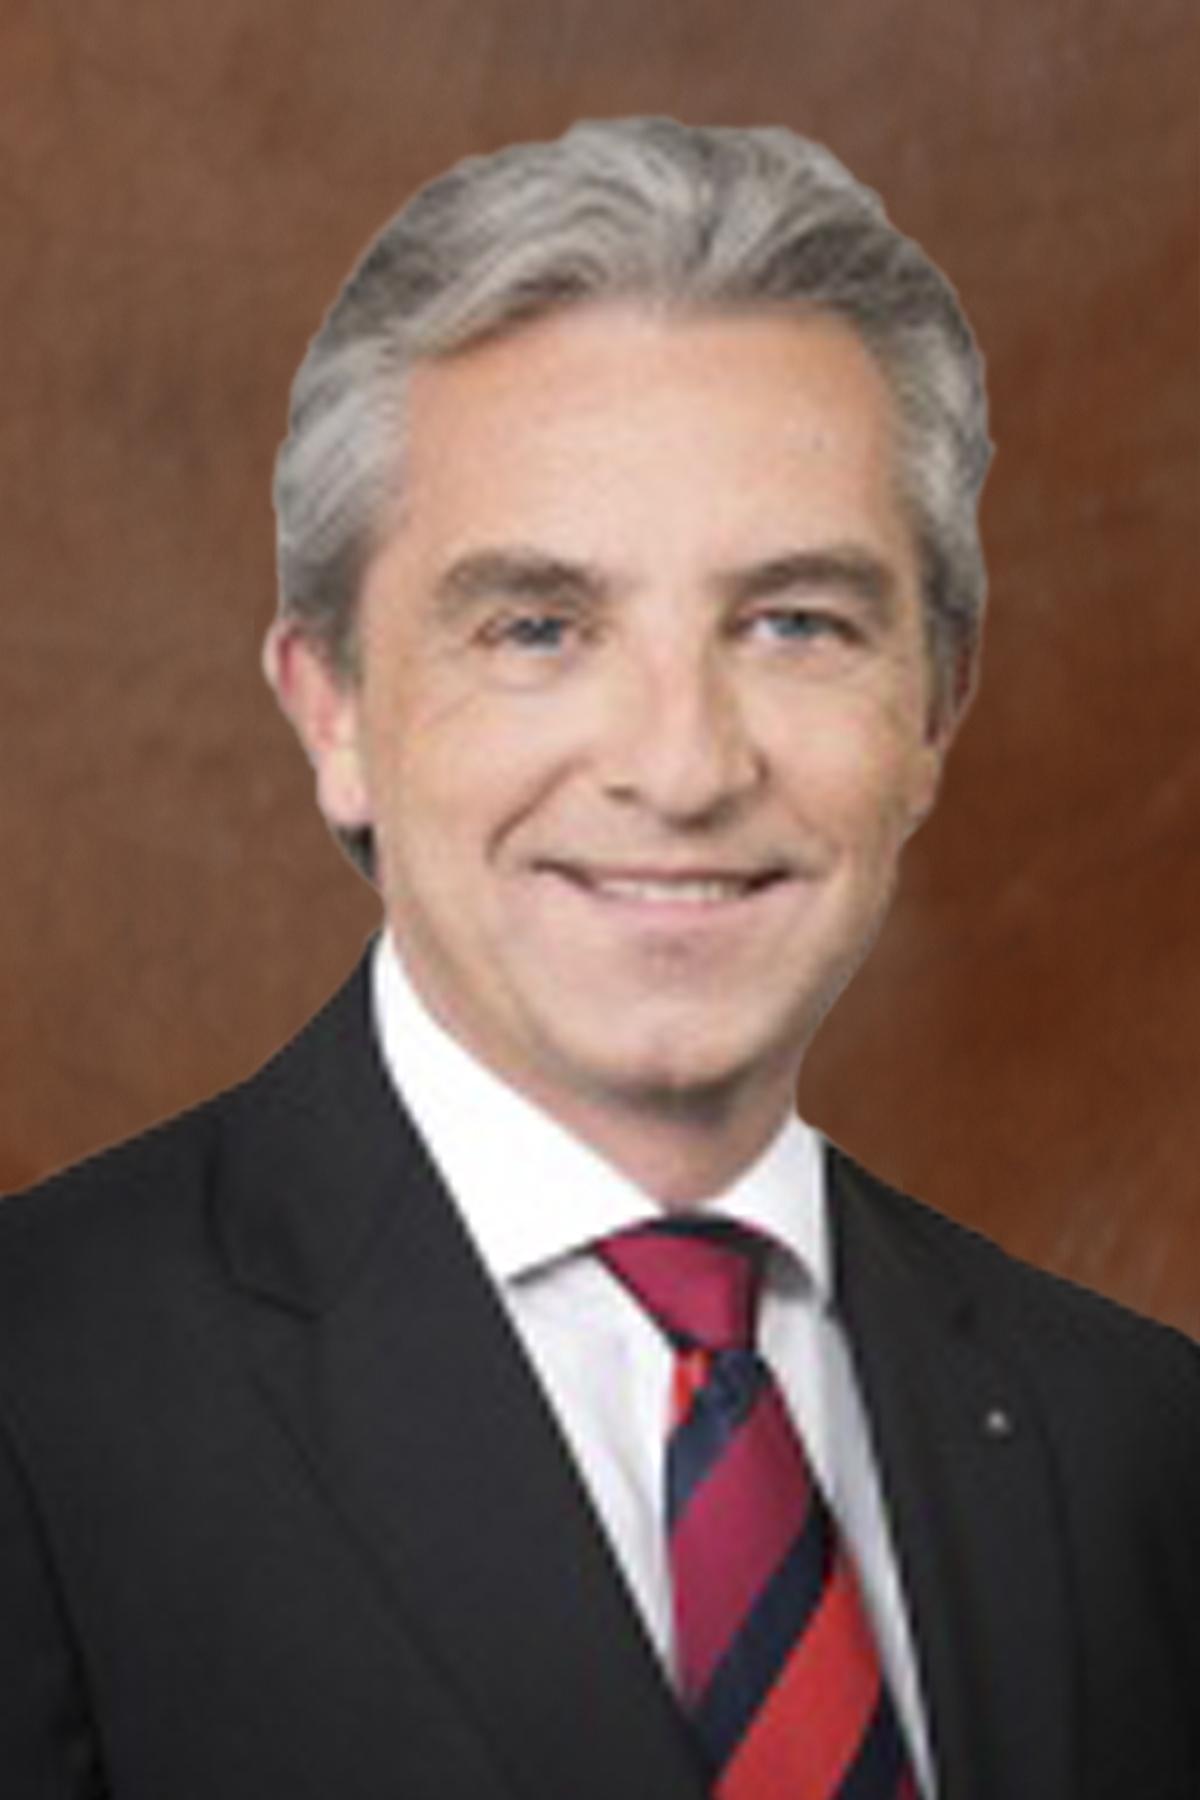 Rainer Virnich